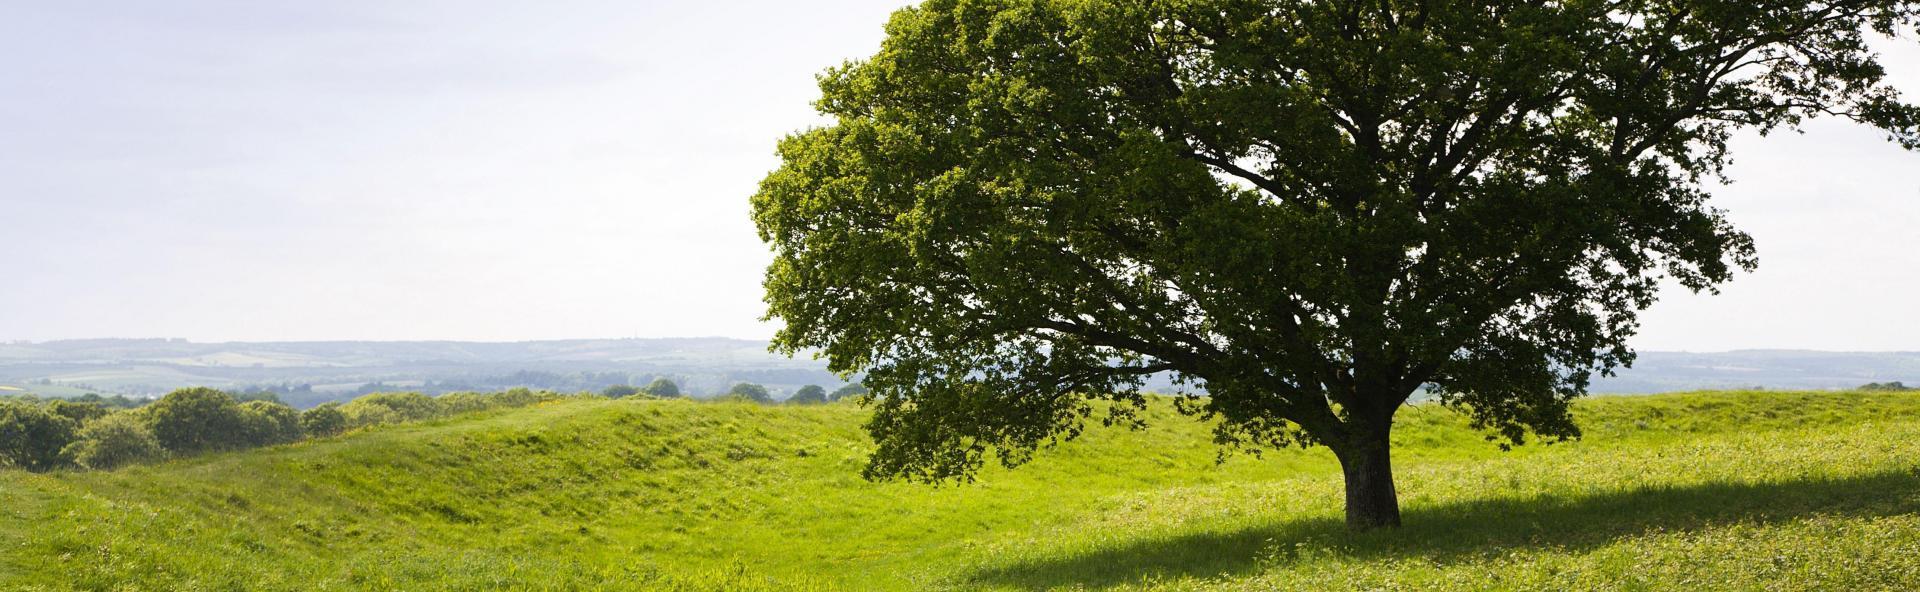 baner z drzewem eng